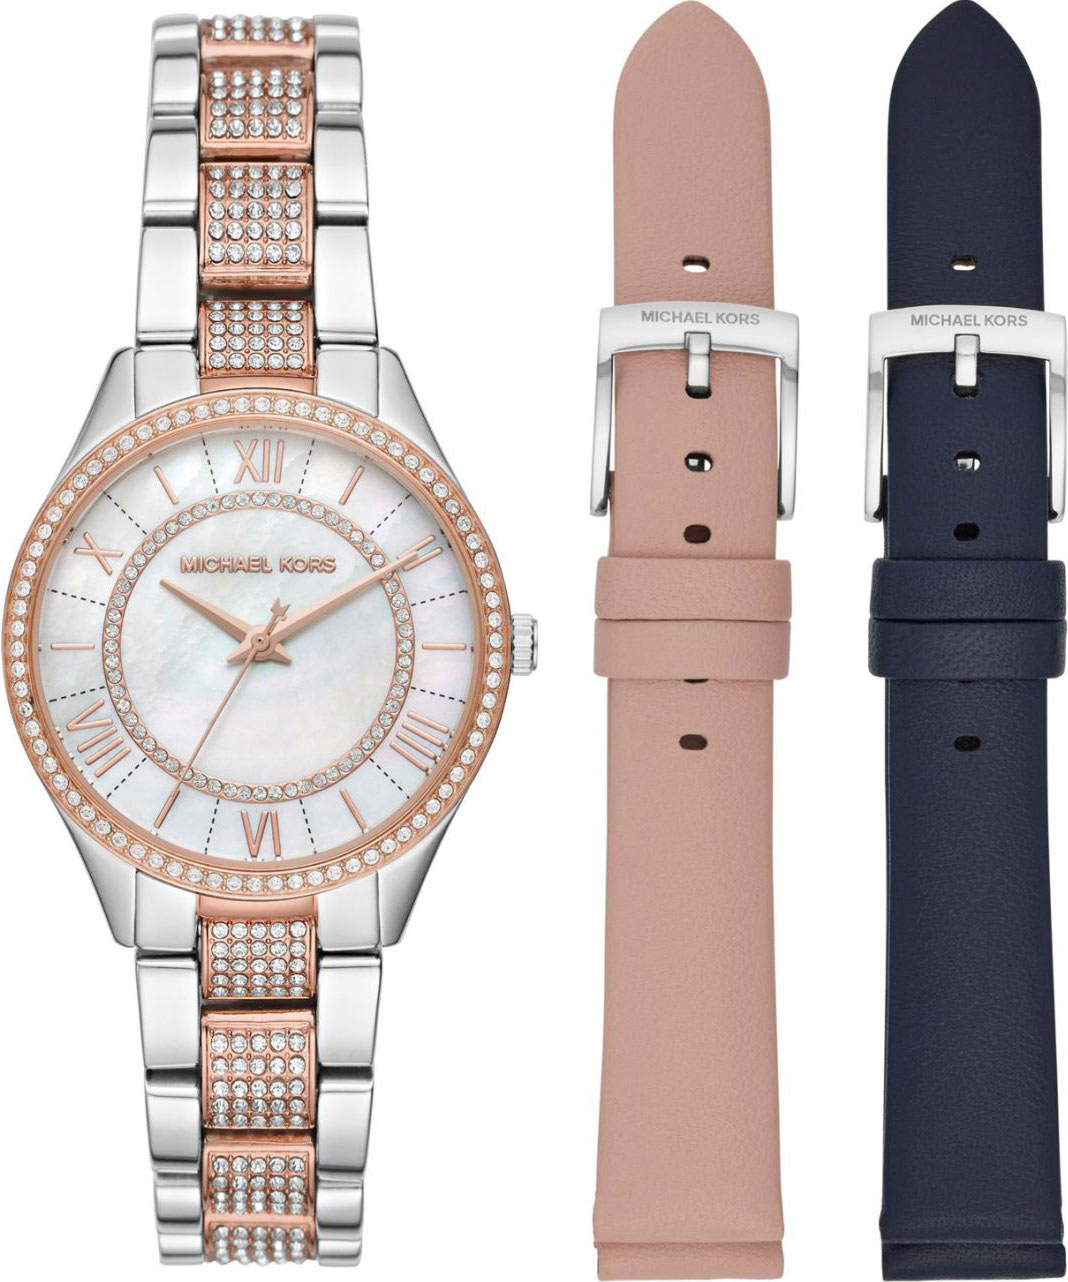 Женские часы Michael Kors MK4366